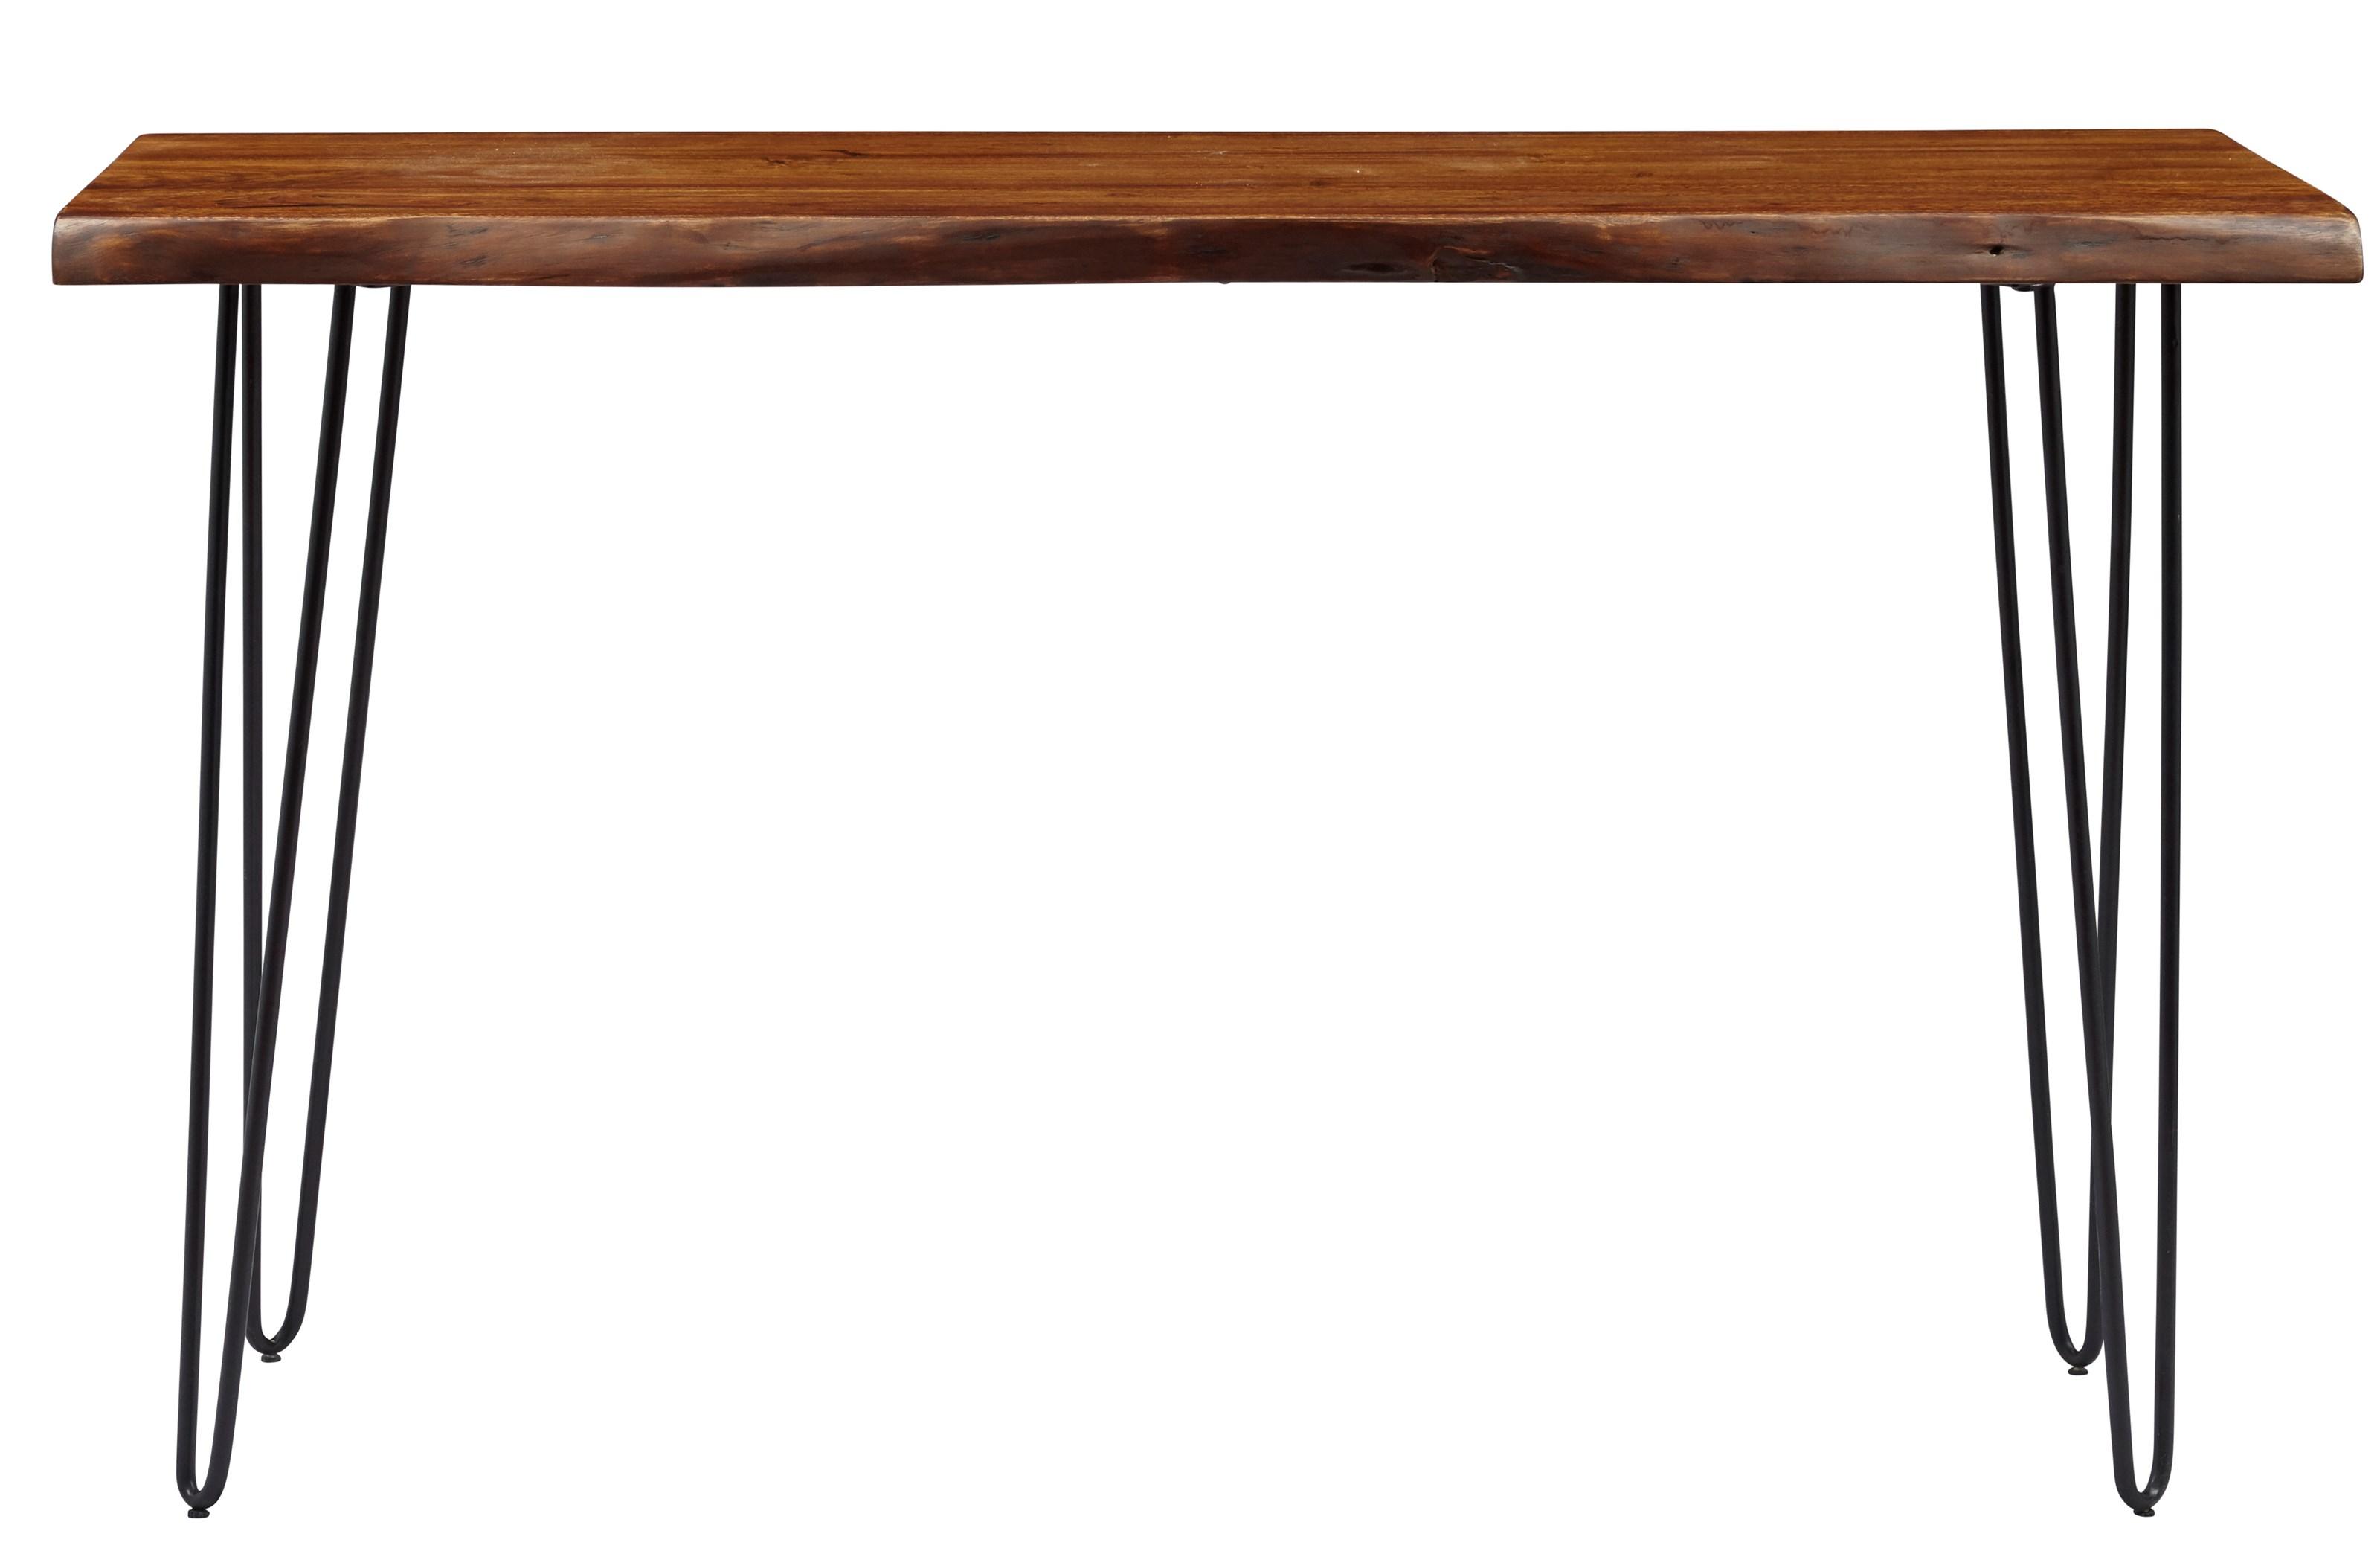 Nature's Edge Sofa Table by Jofran at Stoney Creek Furniture